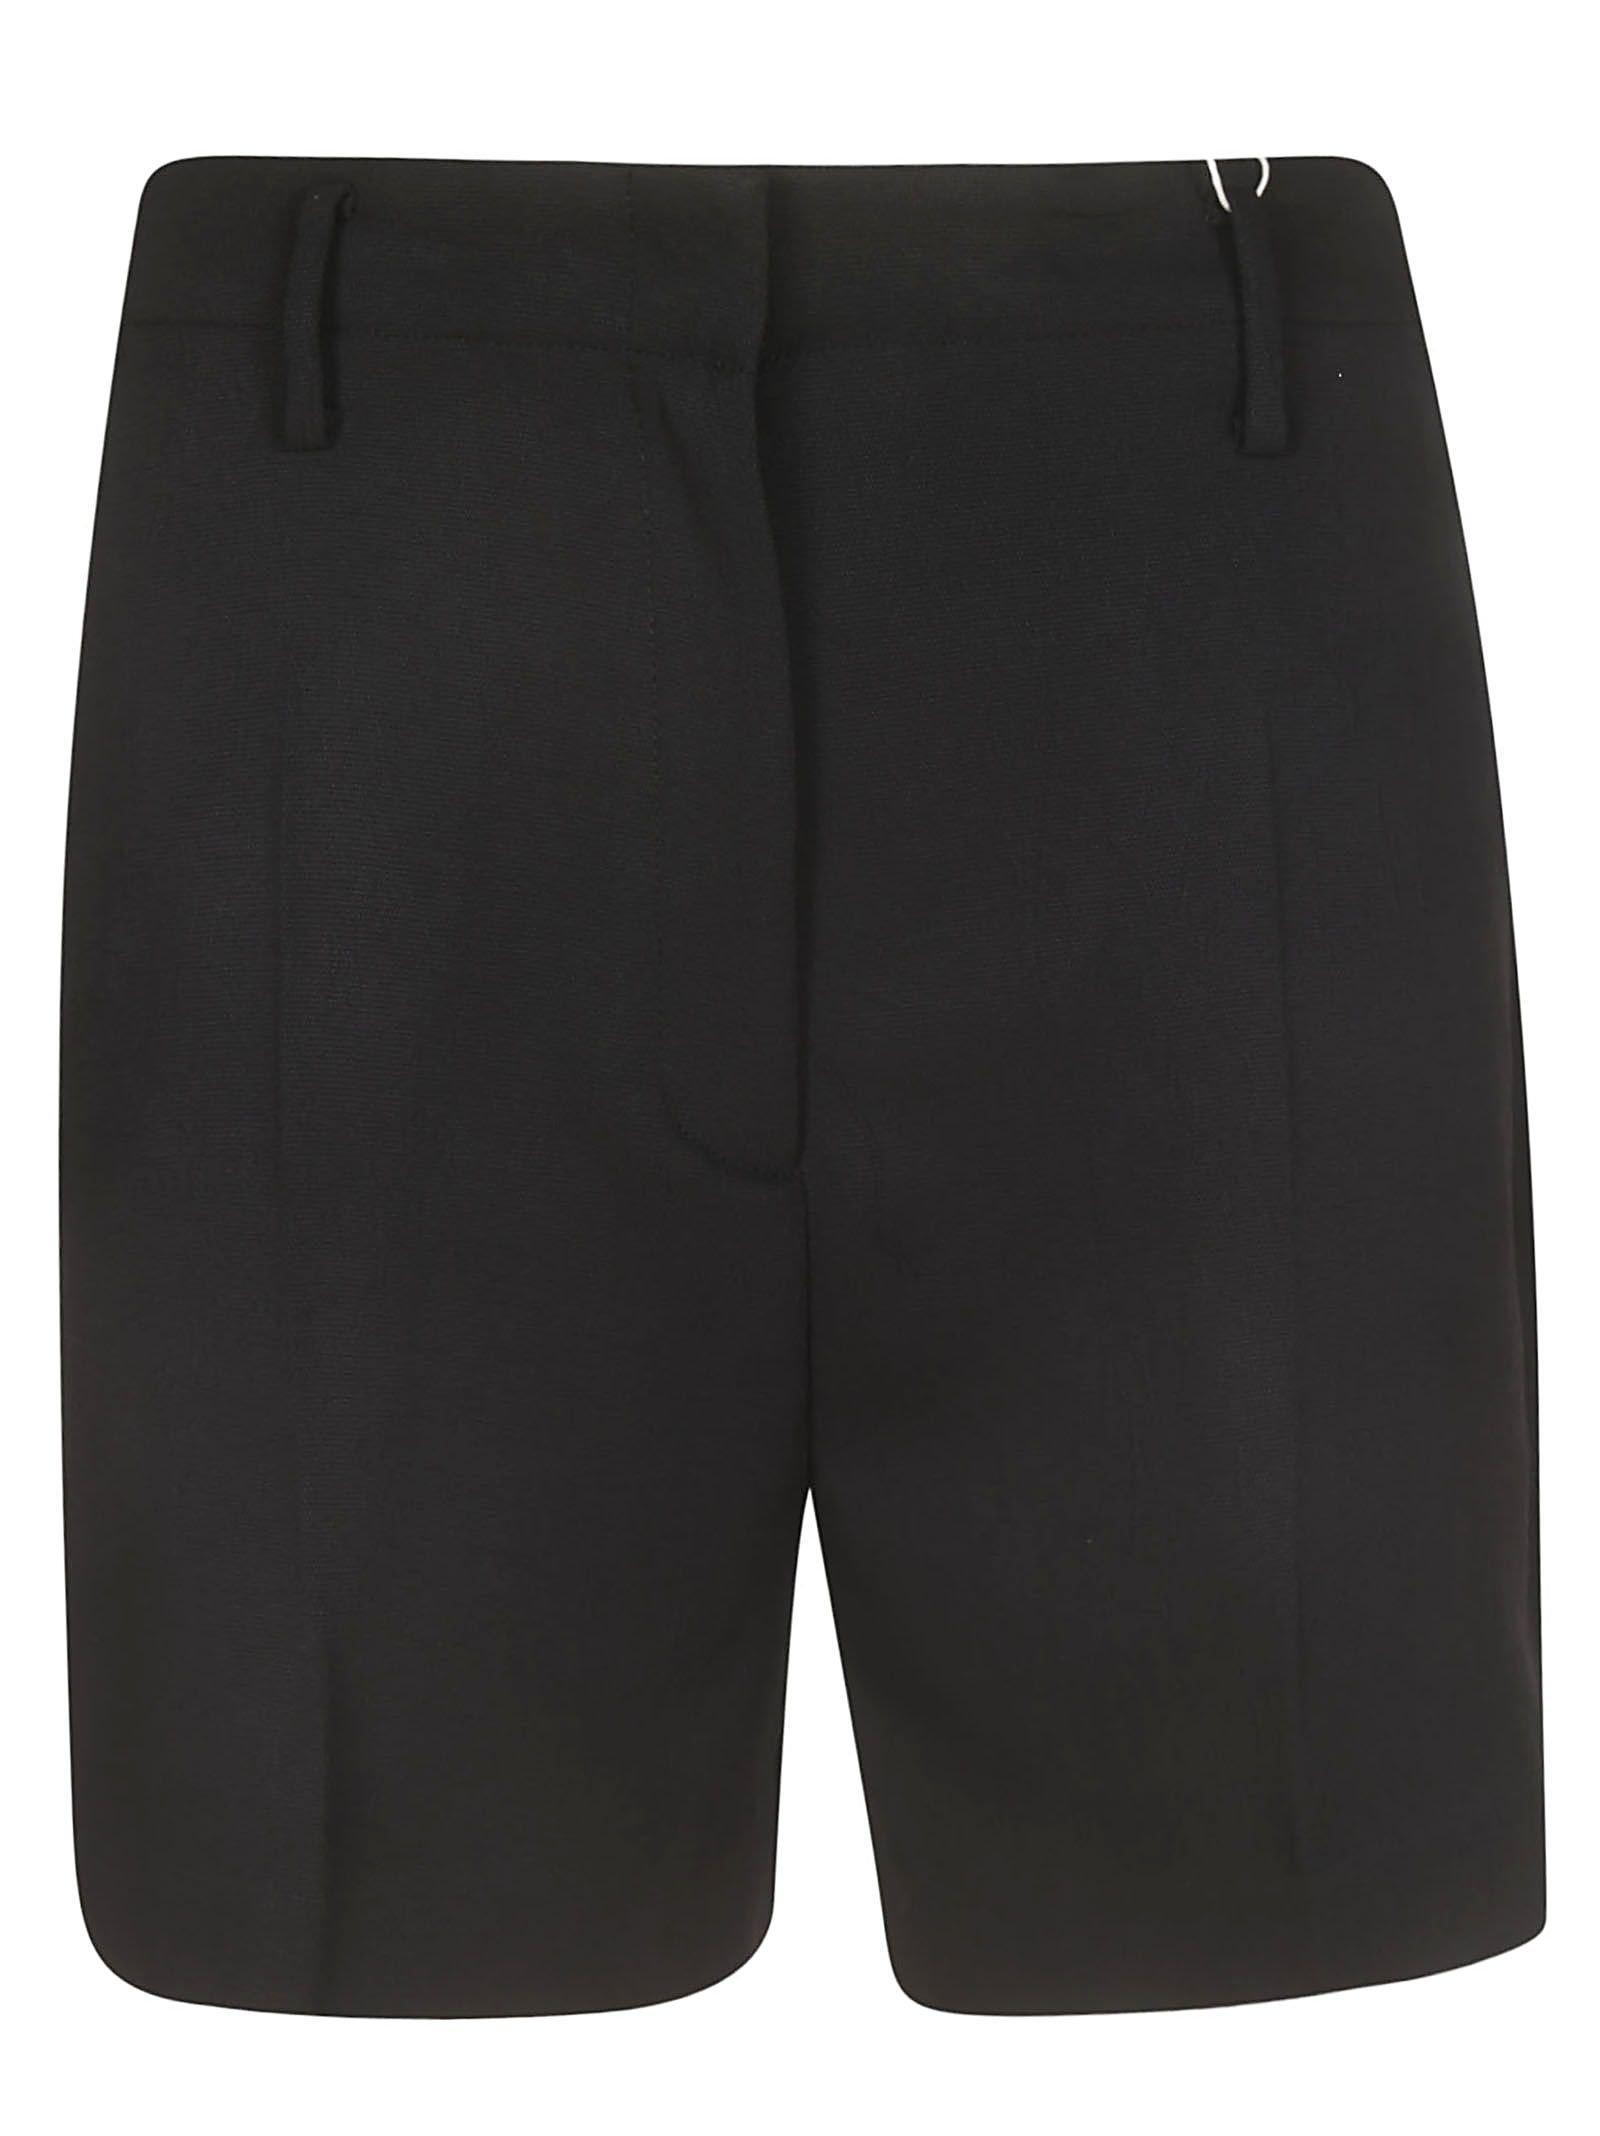 Michael Kors Crushed Suit Shorts